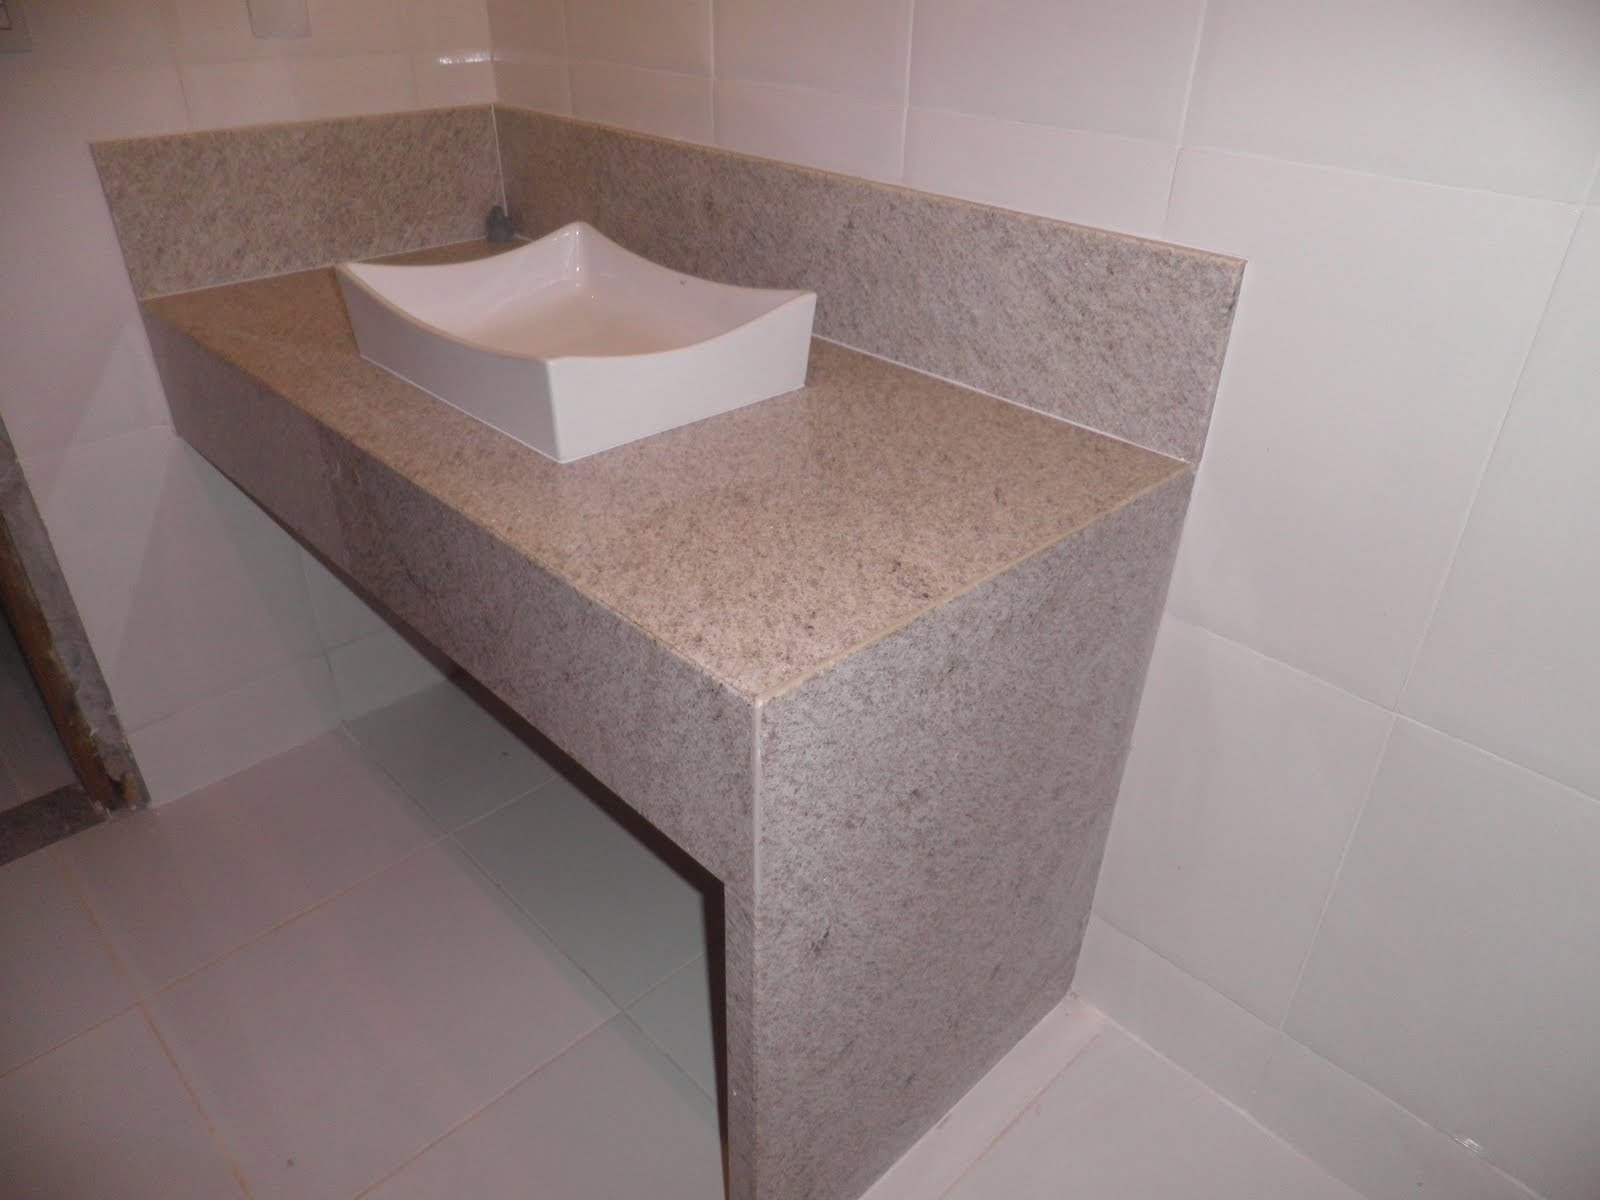 REFORMANDO A DISTANCIA: Bancada do Banheiro Linda!!! #73594F 1600x1200 Bancada Banheiro Granito Branco